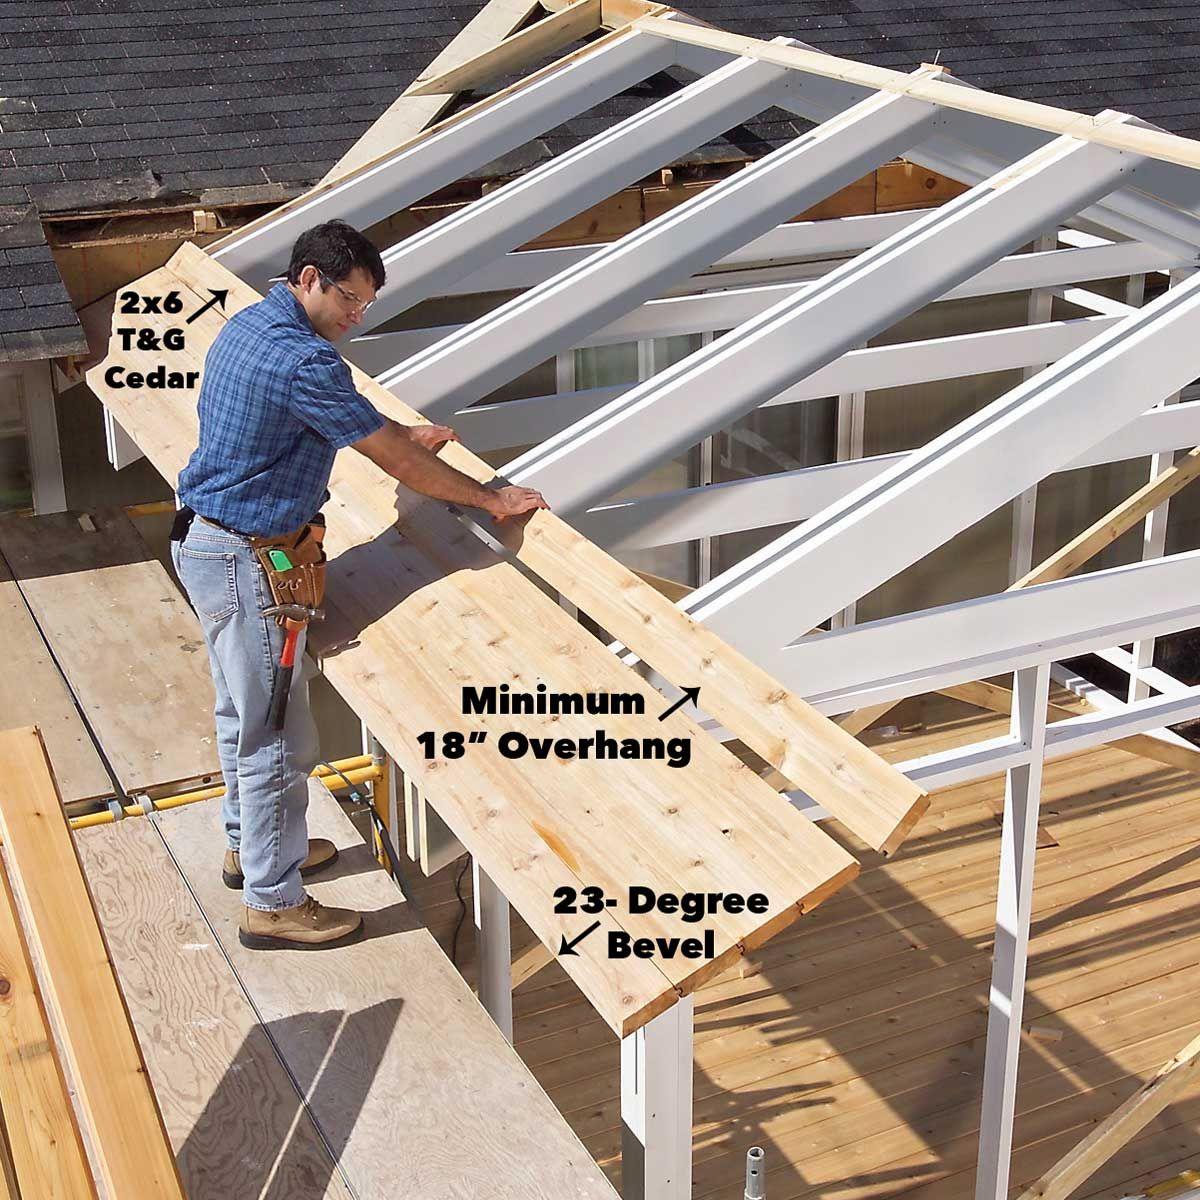 How To Build A Porch Screen Porch Construction Building A Porch Porch Design Porch Plans